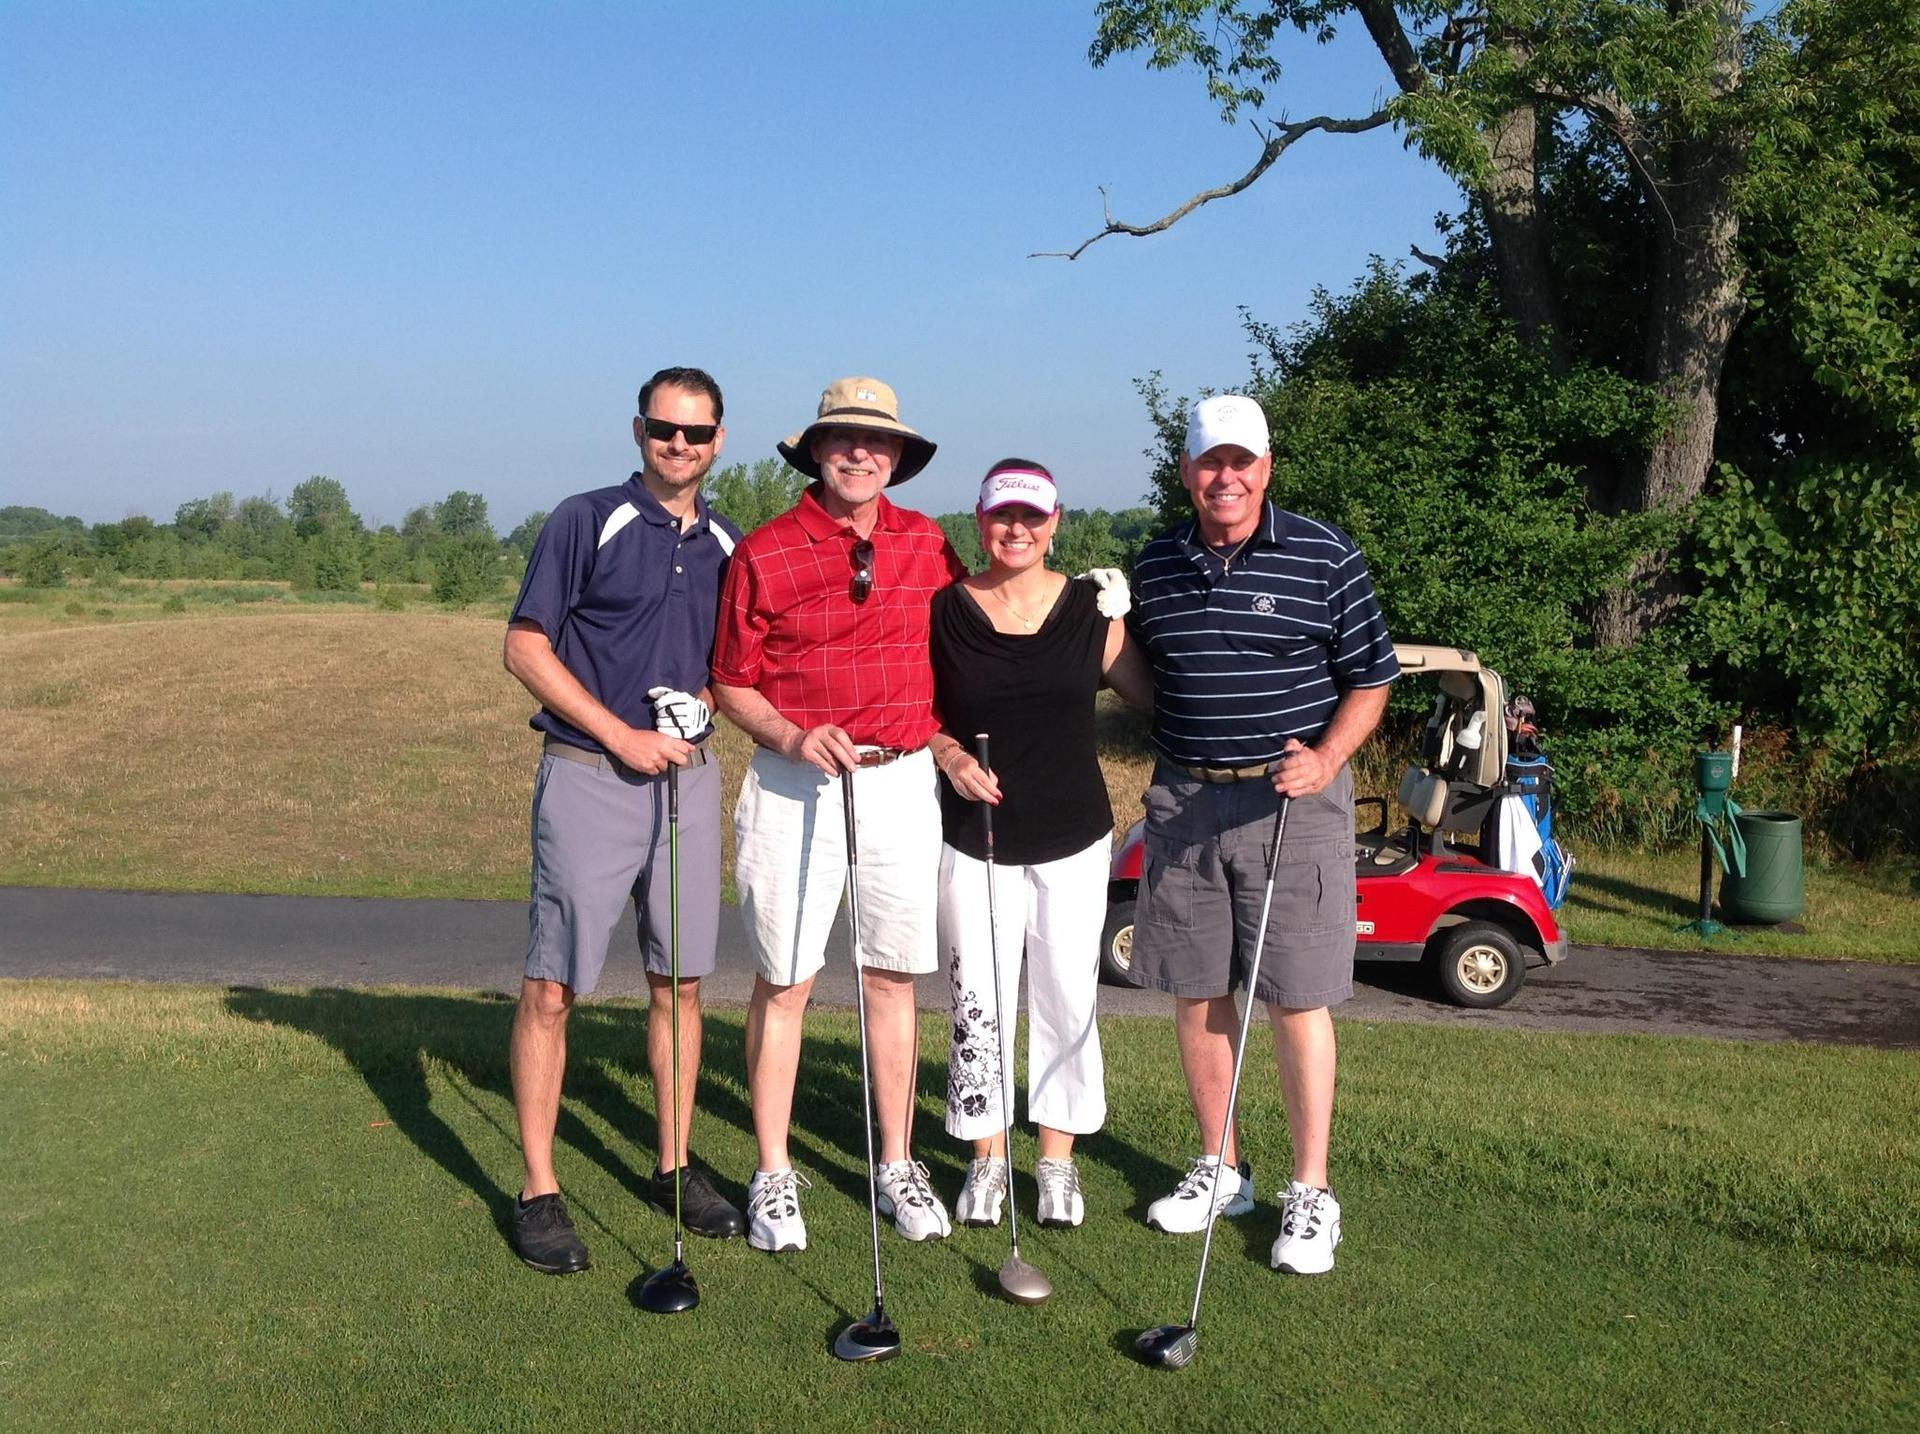 Events- 2018 Sister Maria Golf Tournament